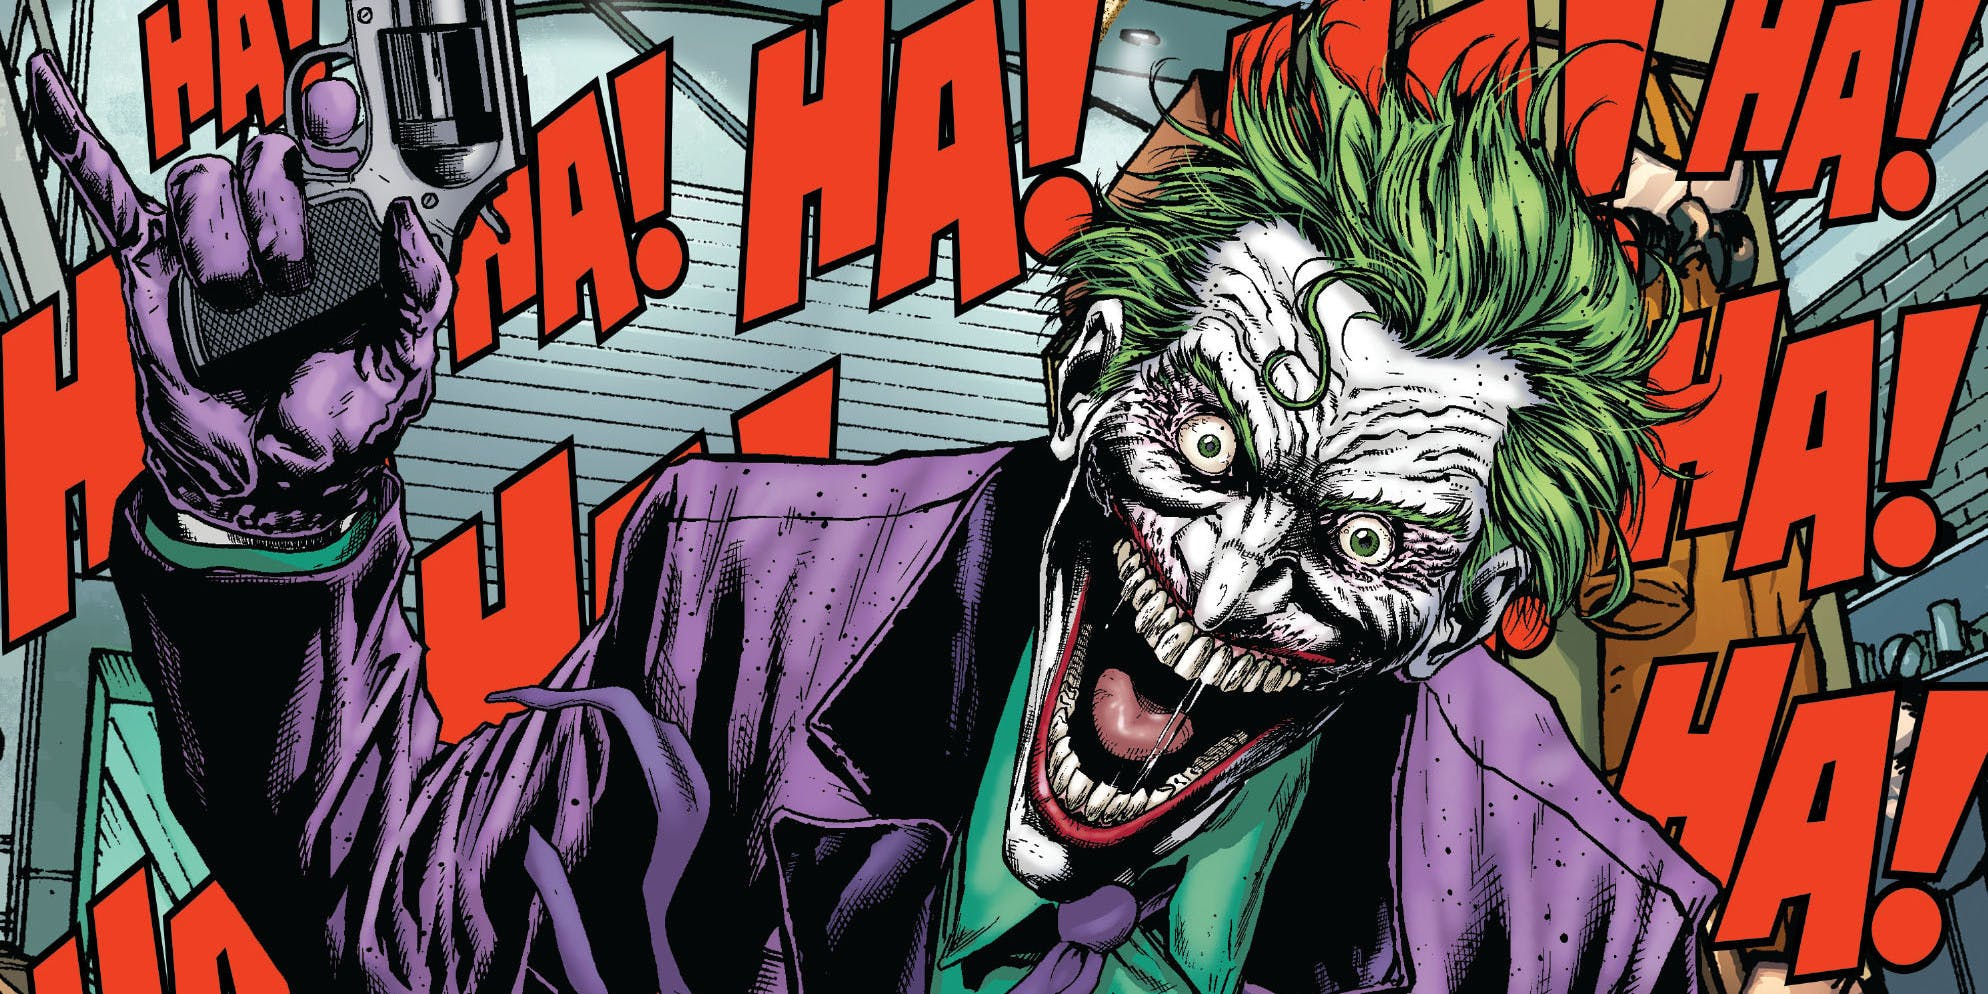 Joker : Alec Baldwin rejoint le casting aux côtés de Joaquin Phoenix